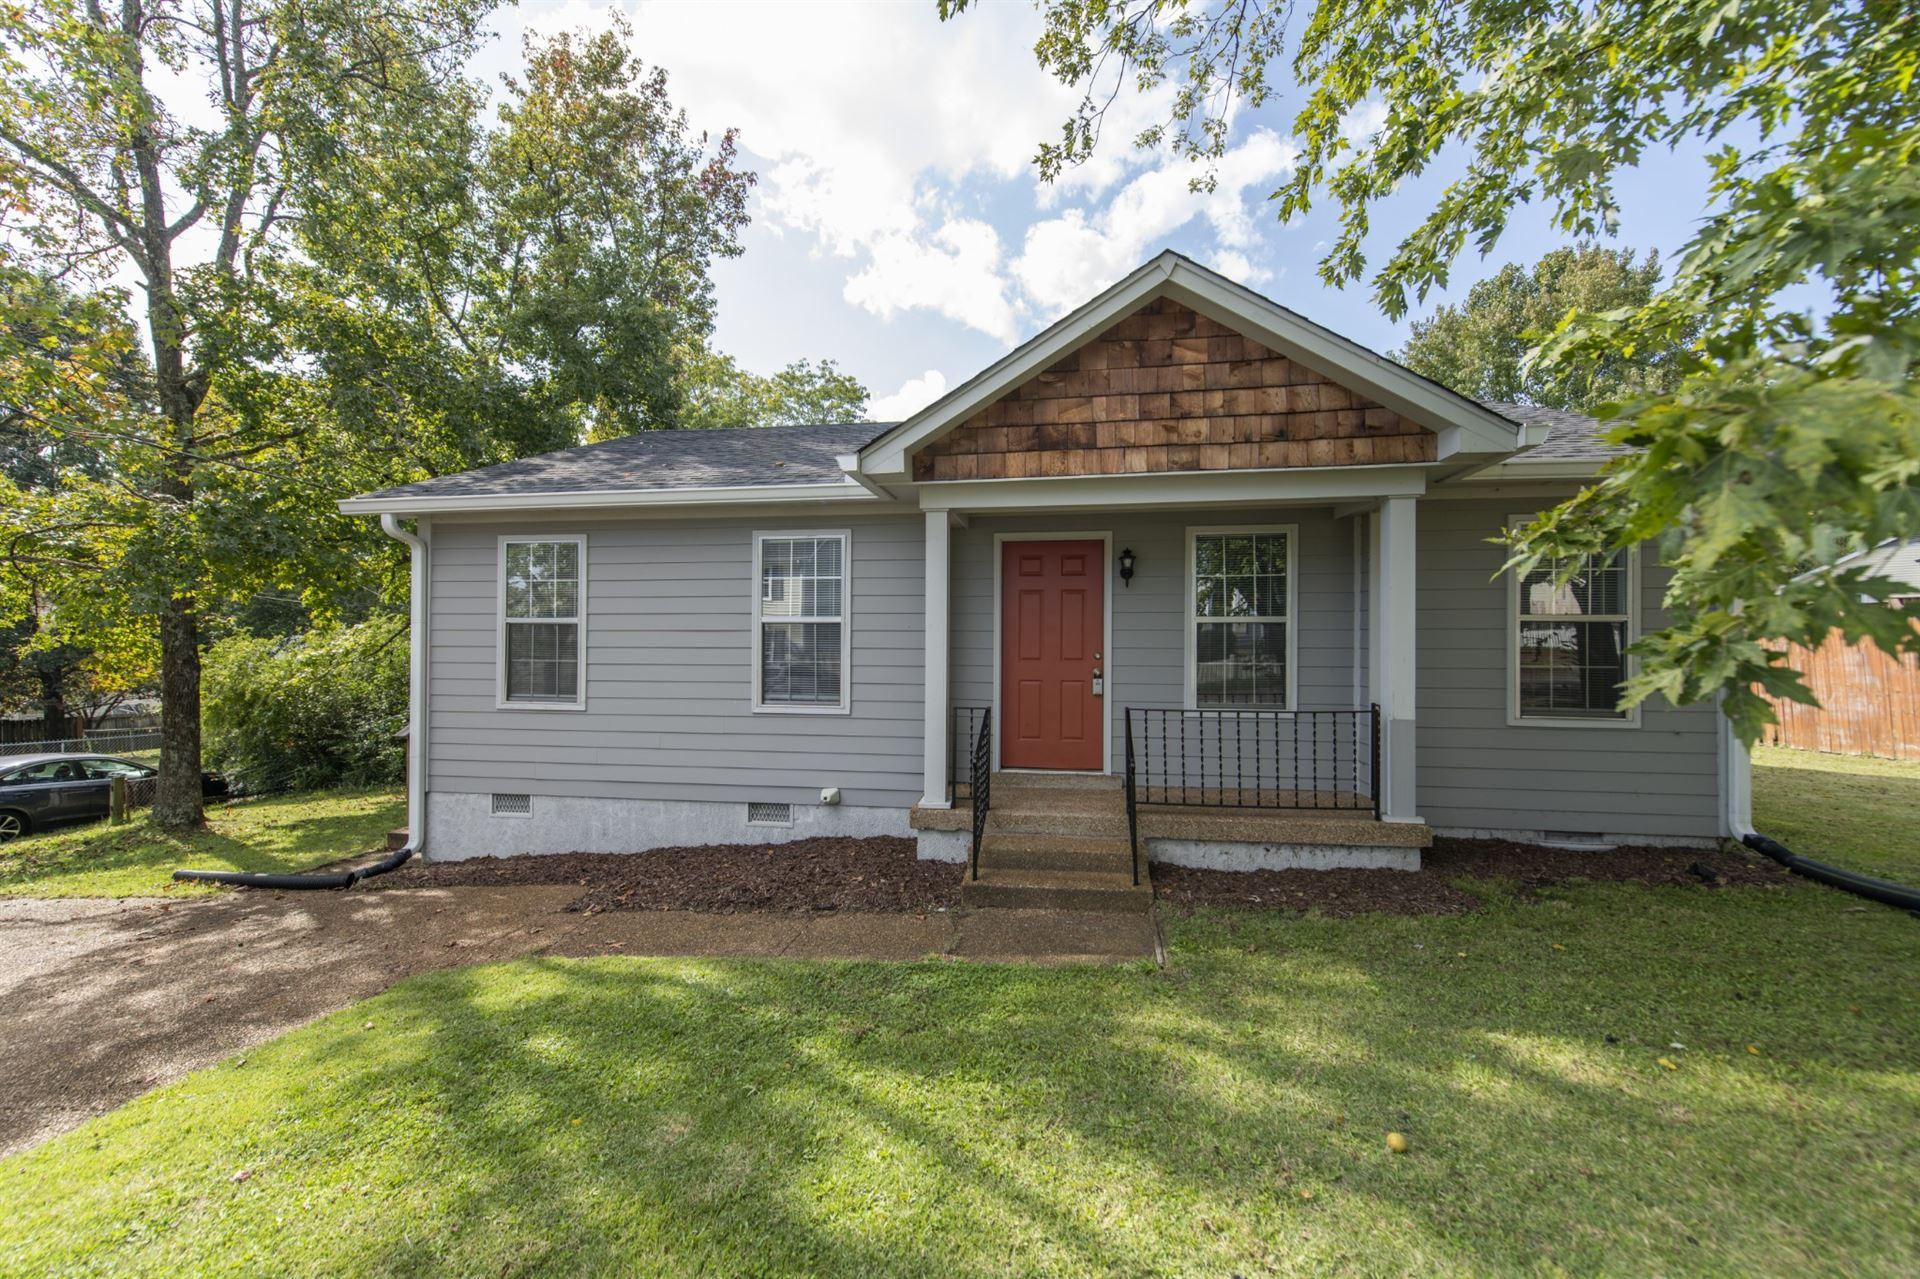 881 Heritage Circle, Madison, TN 37115 - MLS#: 2299759